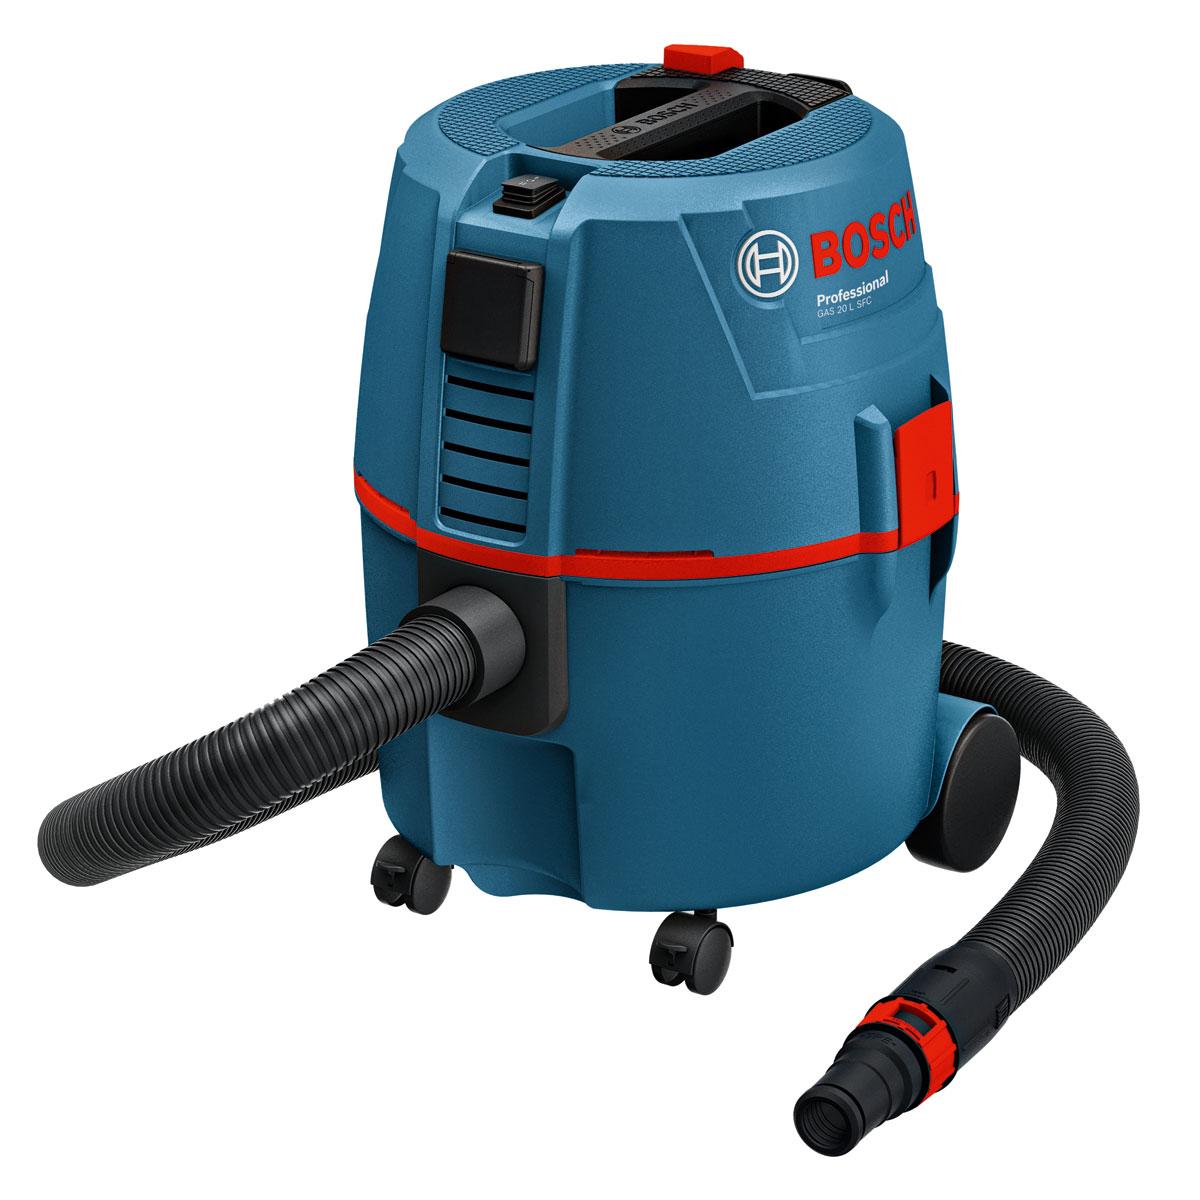 Bosch gas